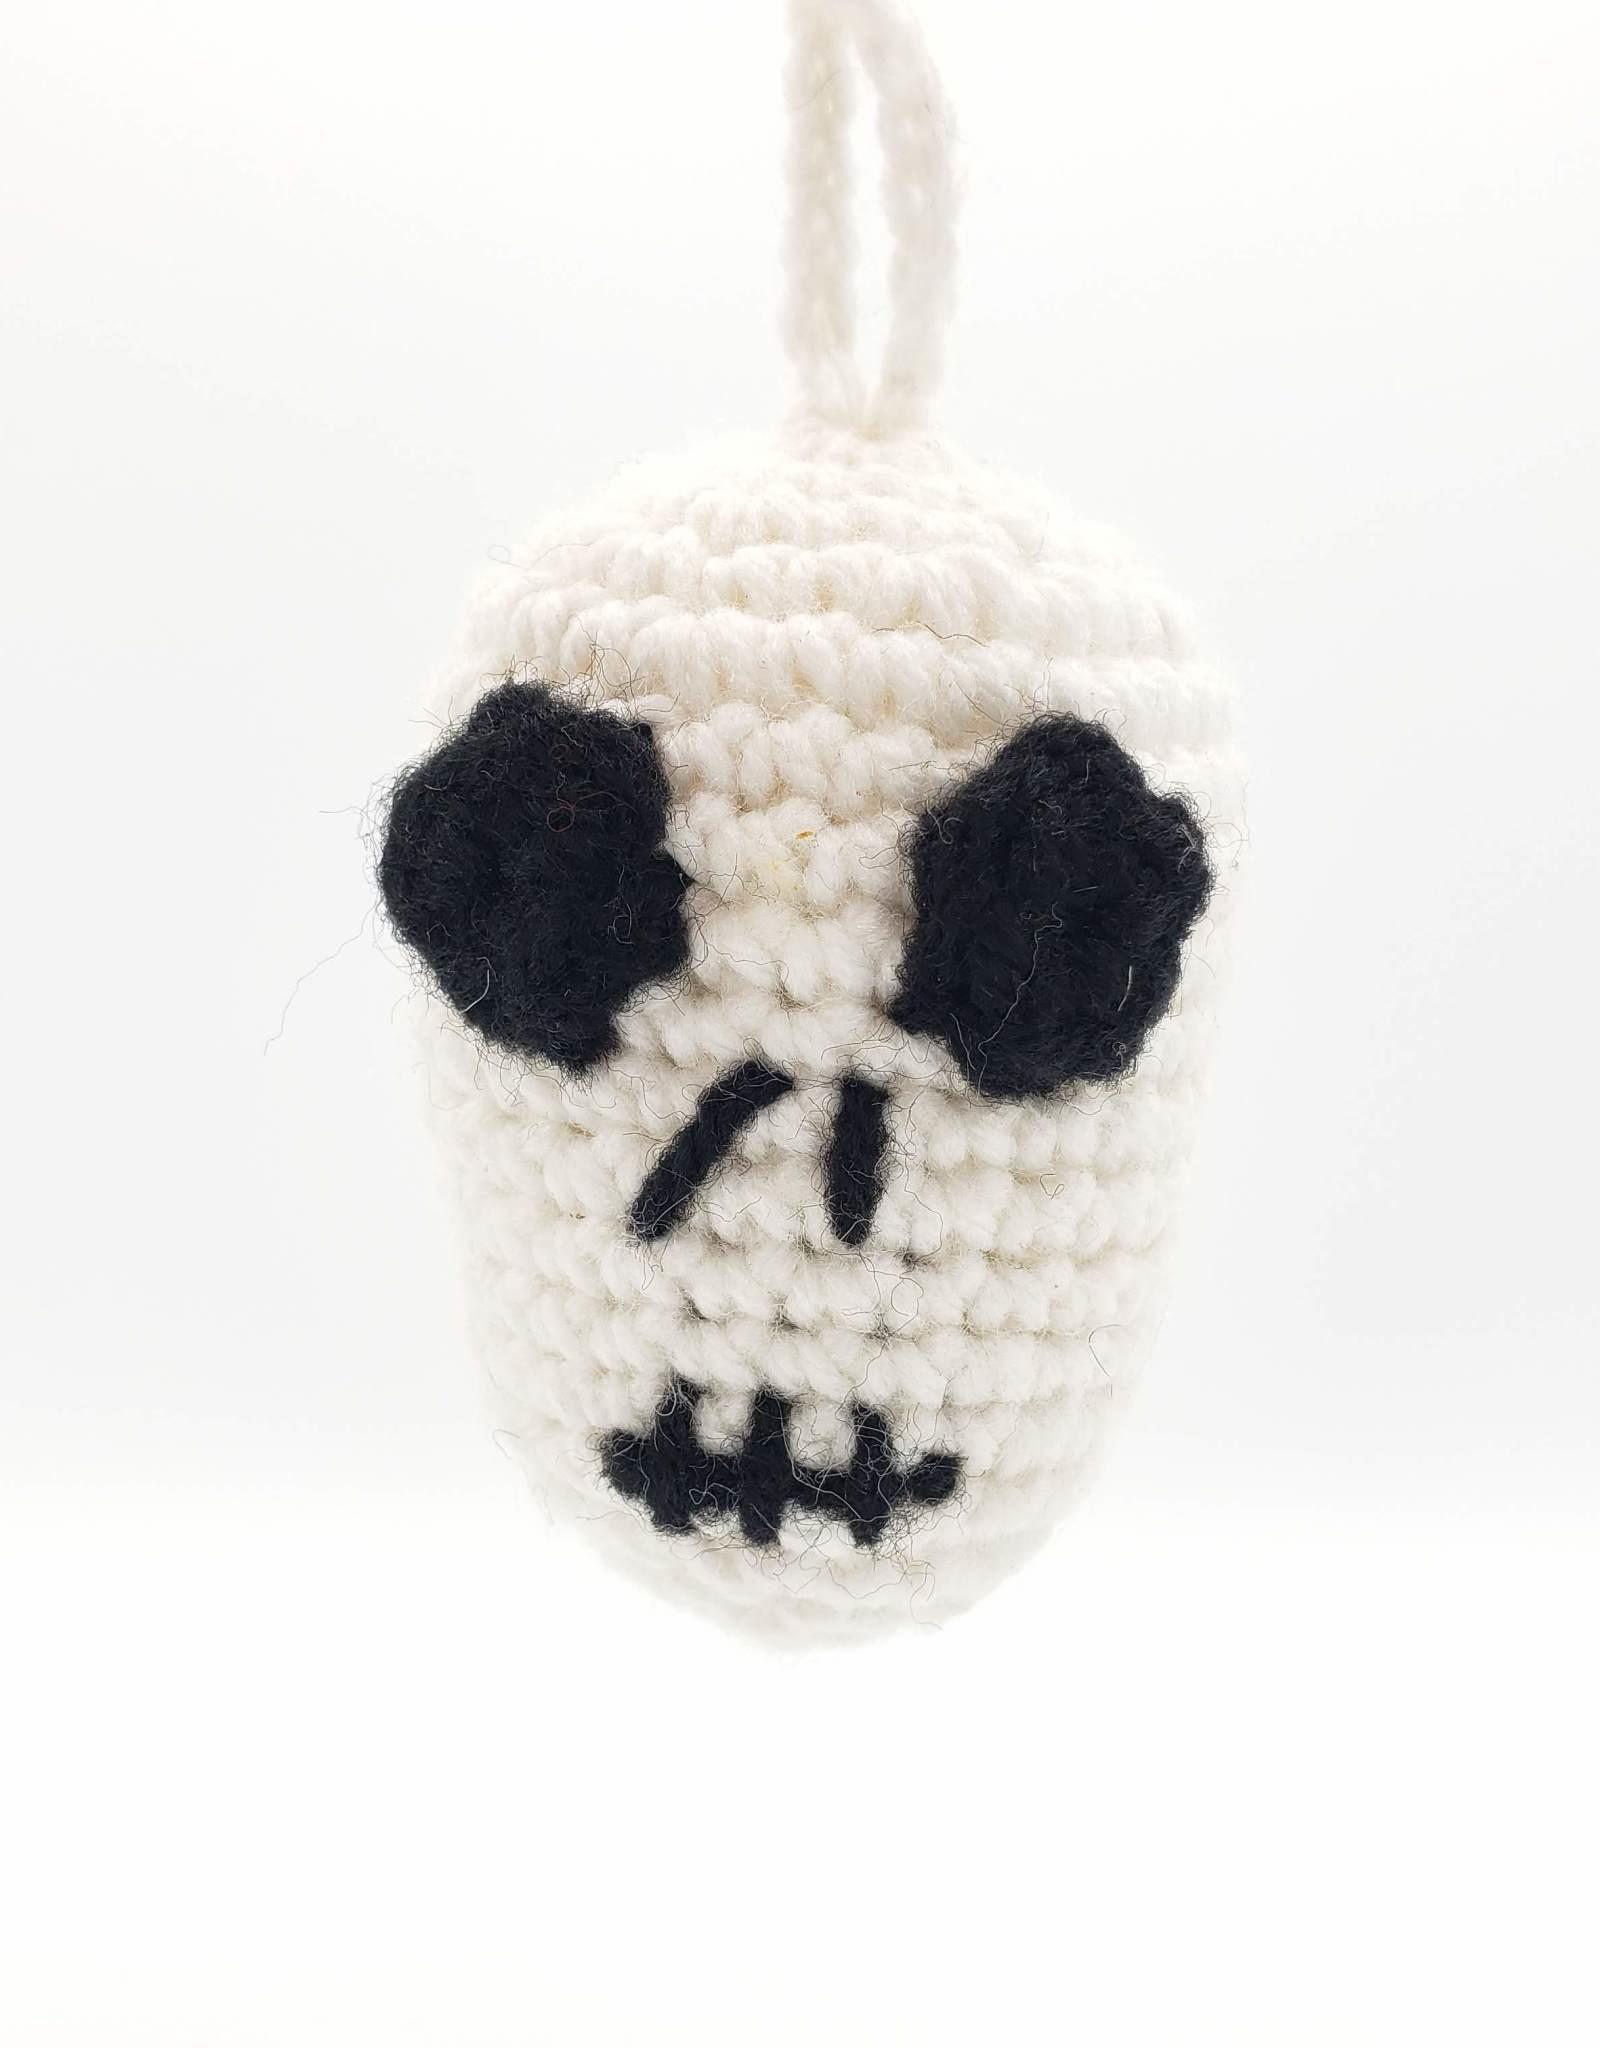 Crocheted Skull Ornament